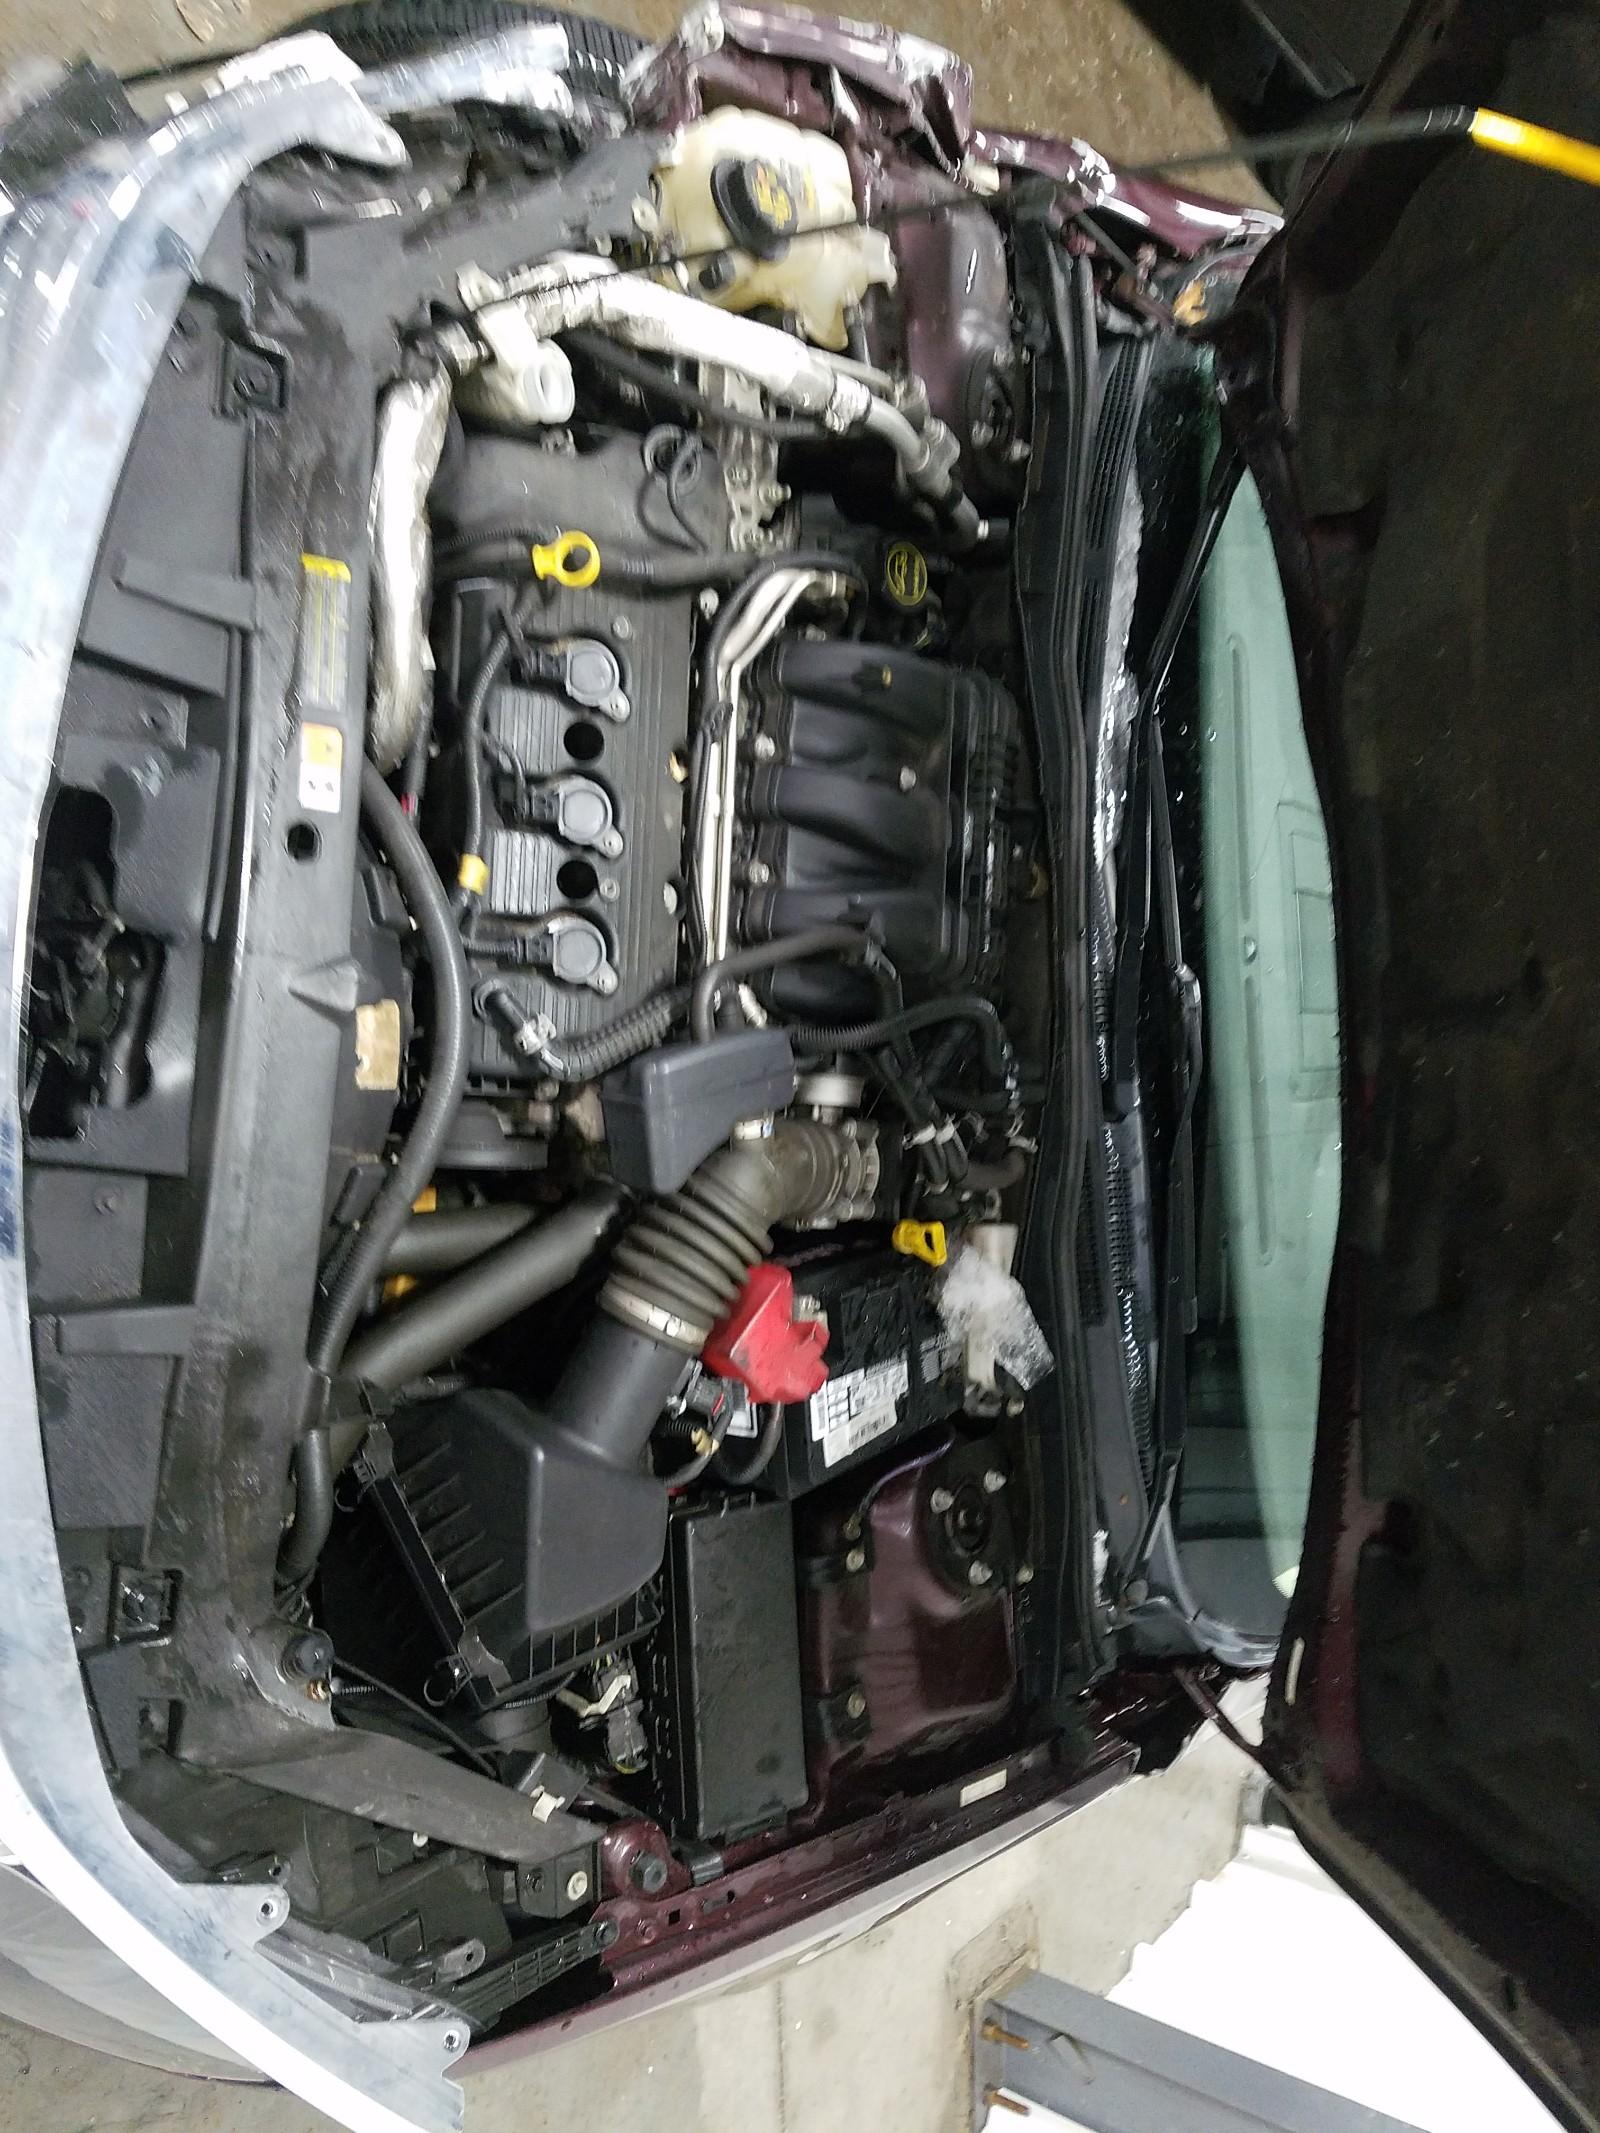 3FAHP0CG6CR288298 - 2012 Ford Fusion Sel 3.0L inside view